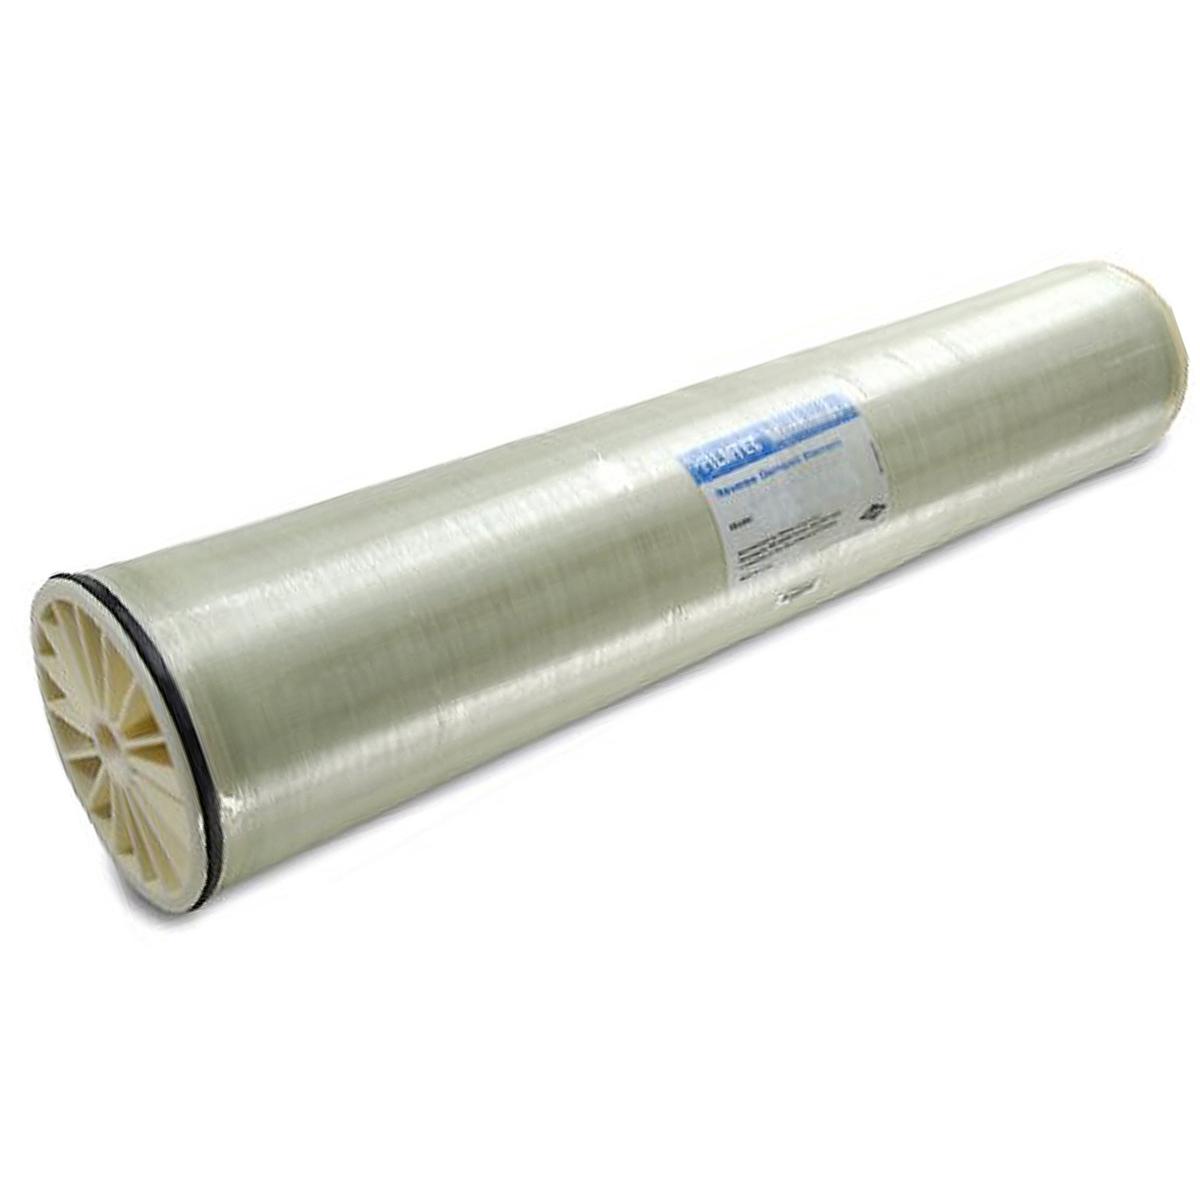 Filmtec Sw30hrle 400 Sea Water Desalination Membrane